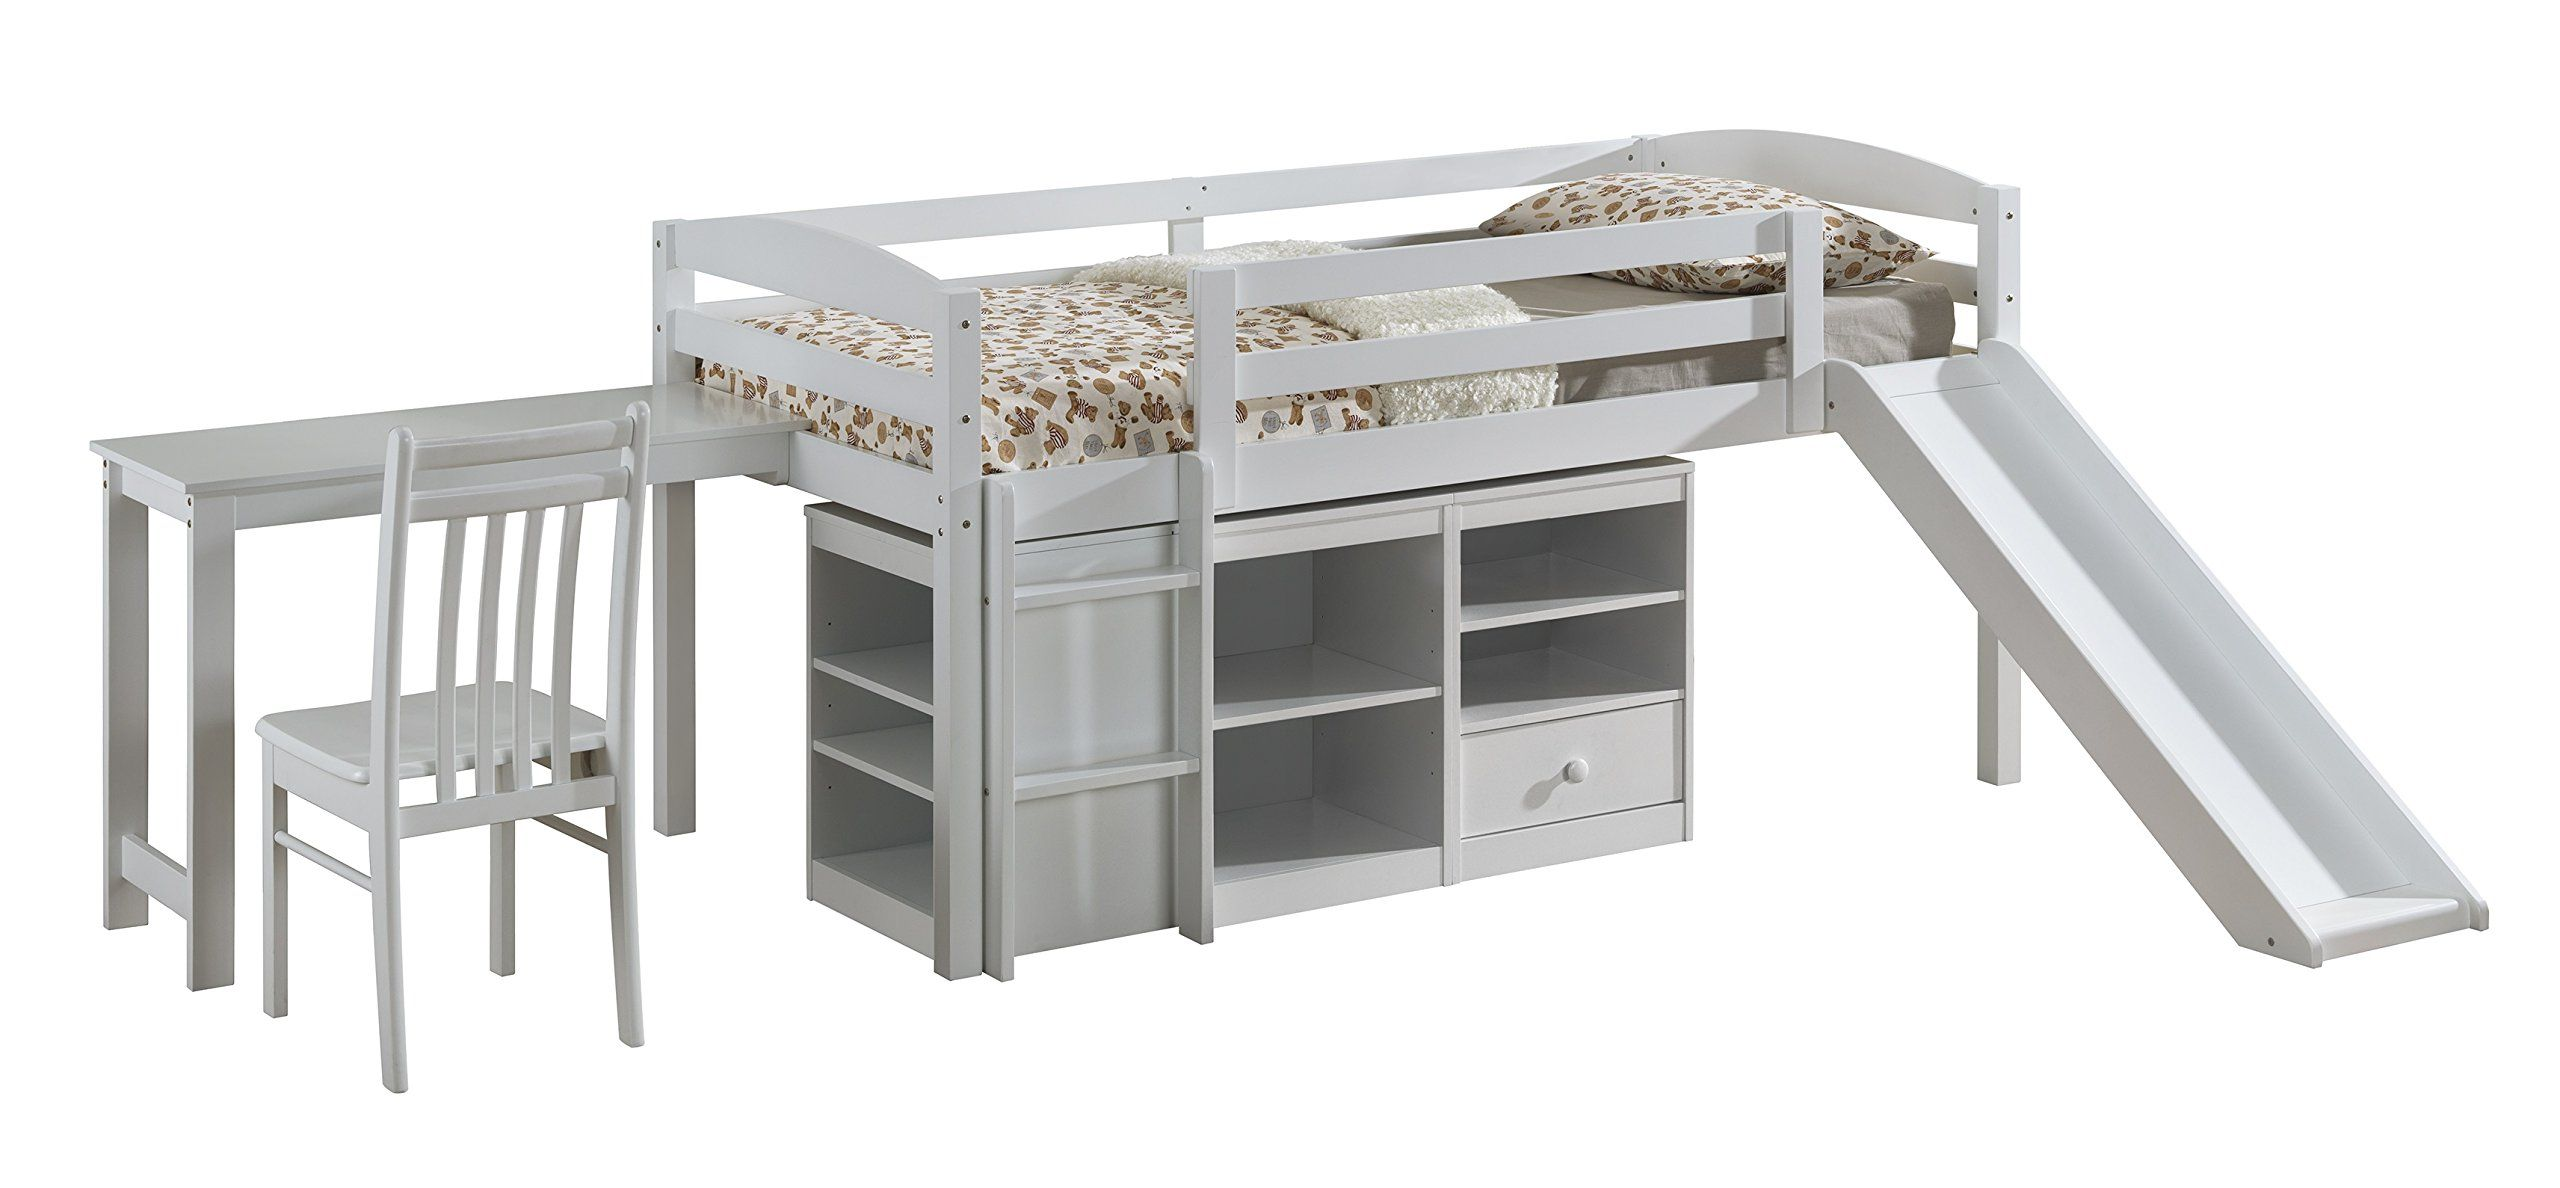 Loft bed with slide weight limit  Fire Department Curtain Set for Junior Loft Bed  Loft beds Junior